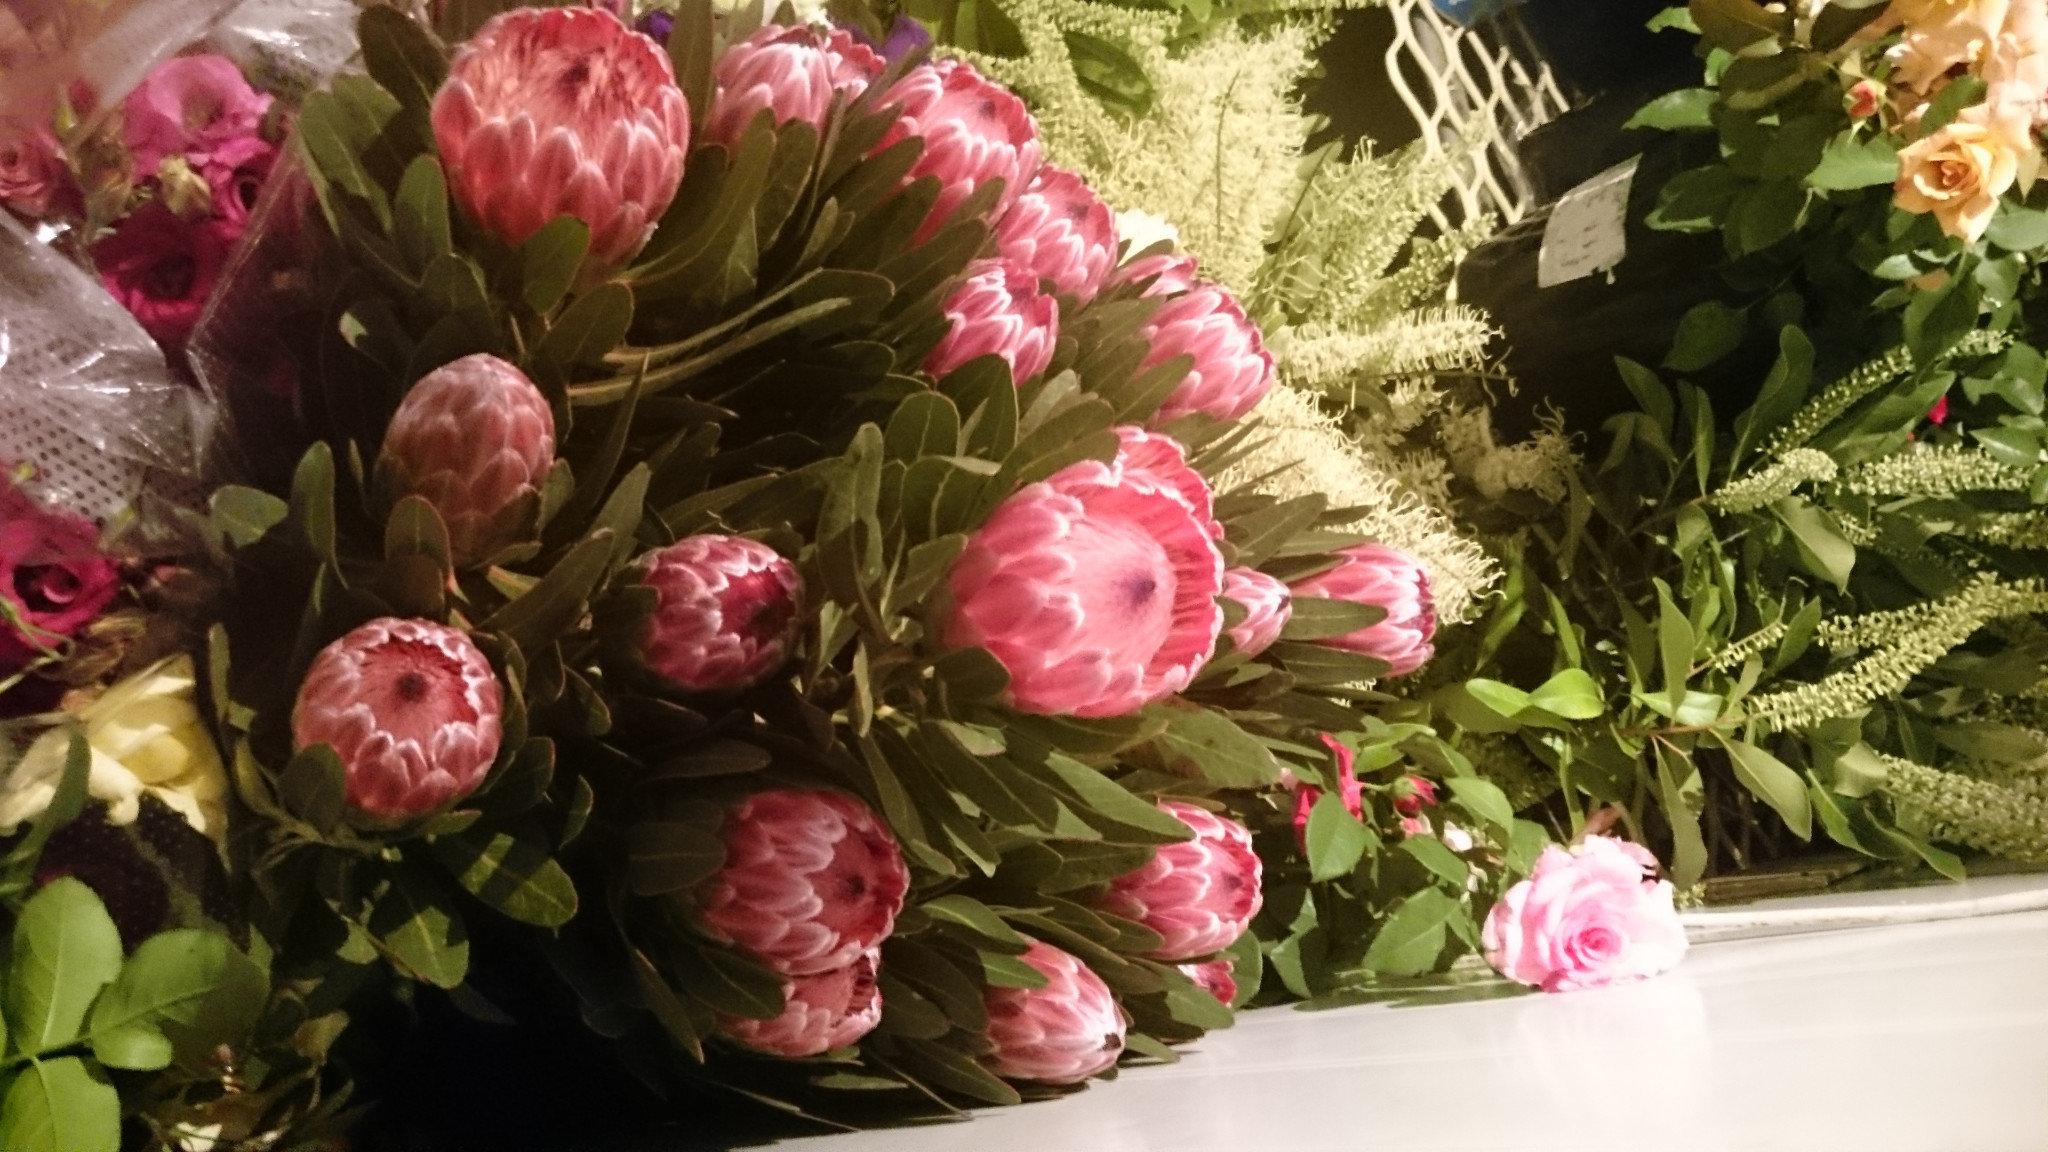 Protea / Pink Ice per stem